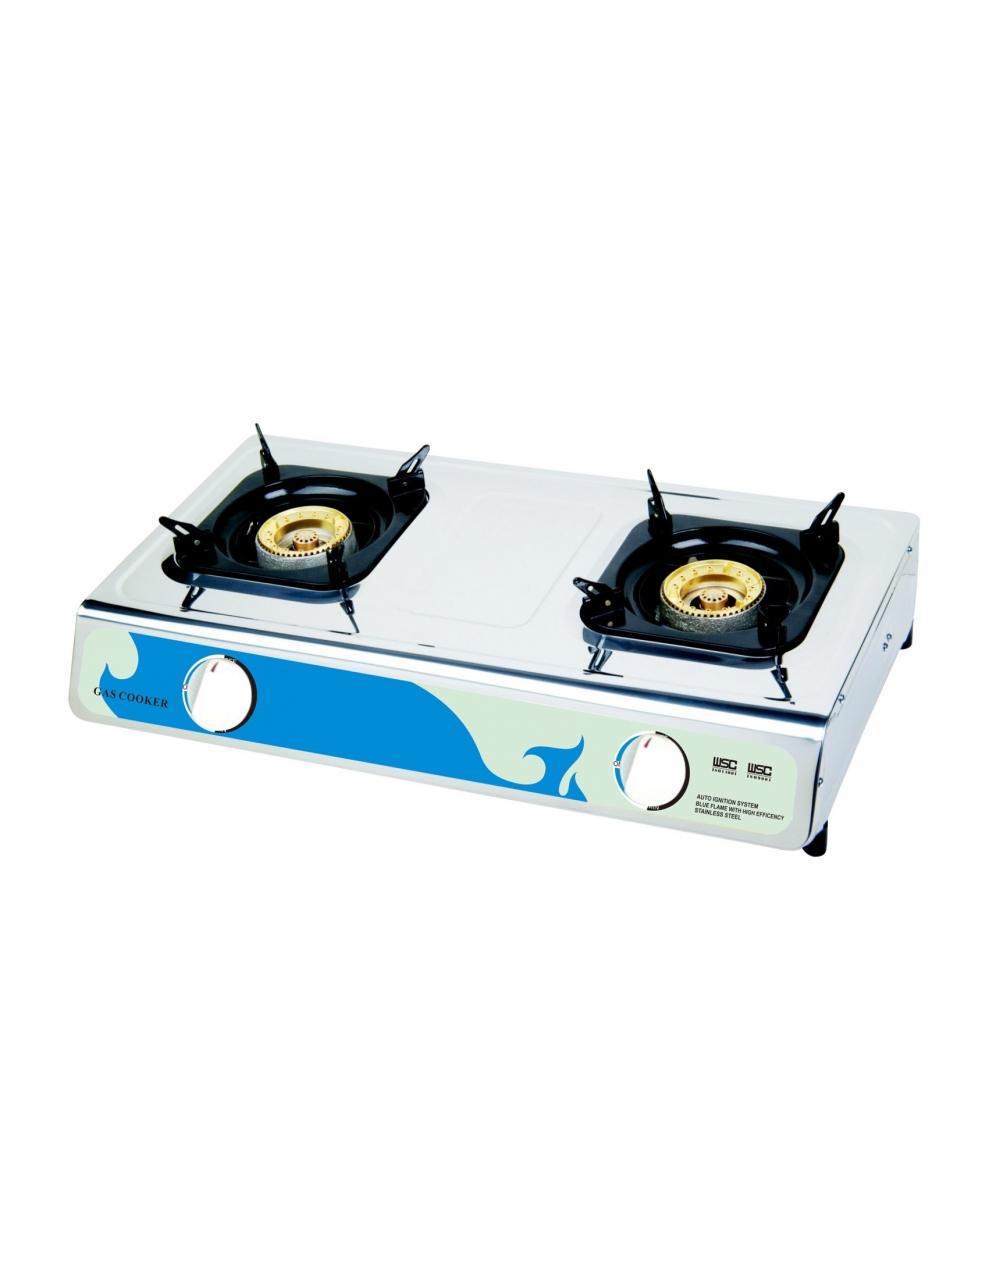 Sayona Automatic 2-Burner Steel Table Top Gas Cooker SB -4127